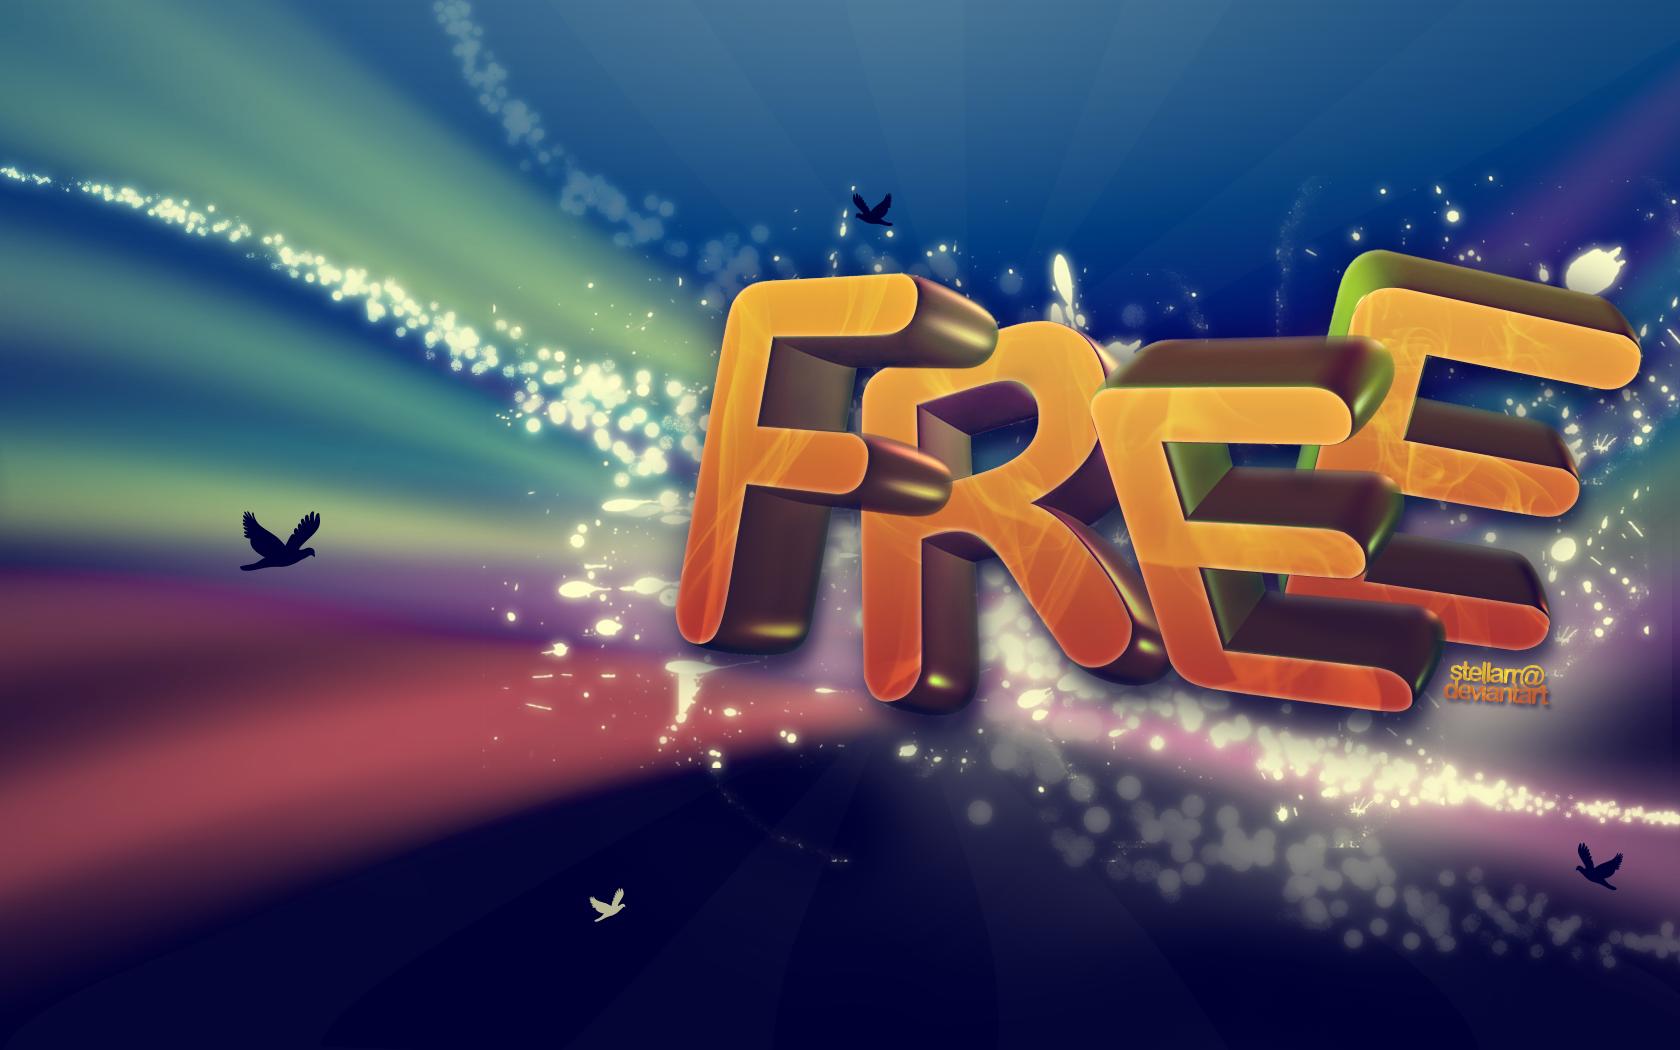 Free by stellarr